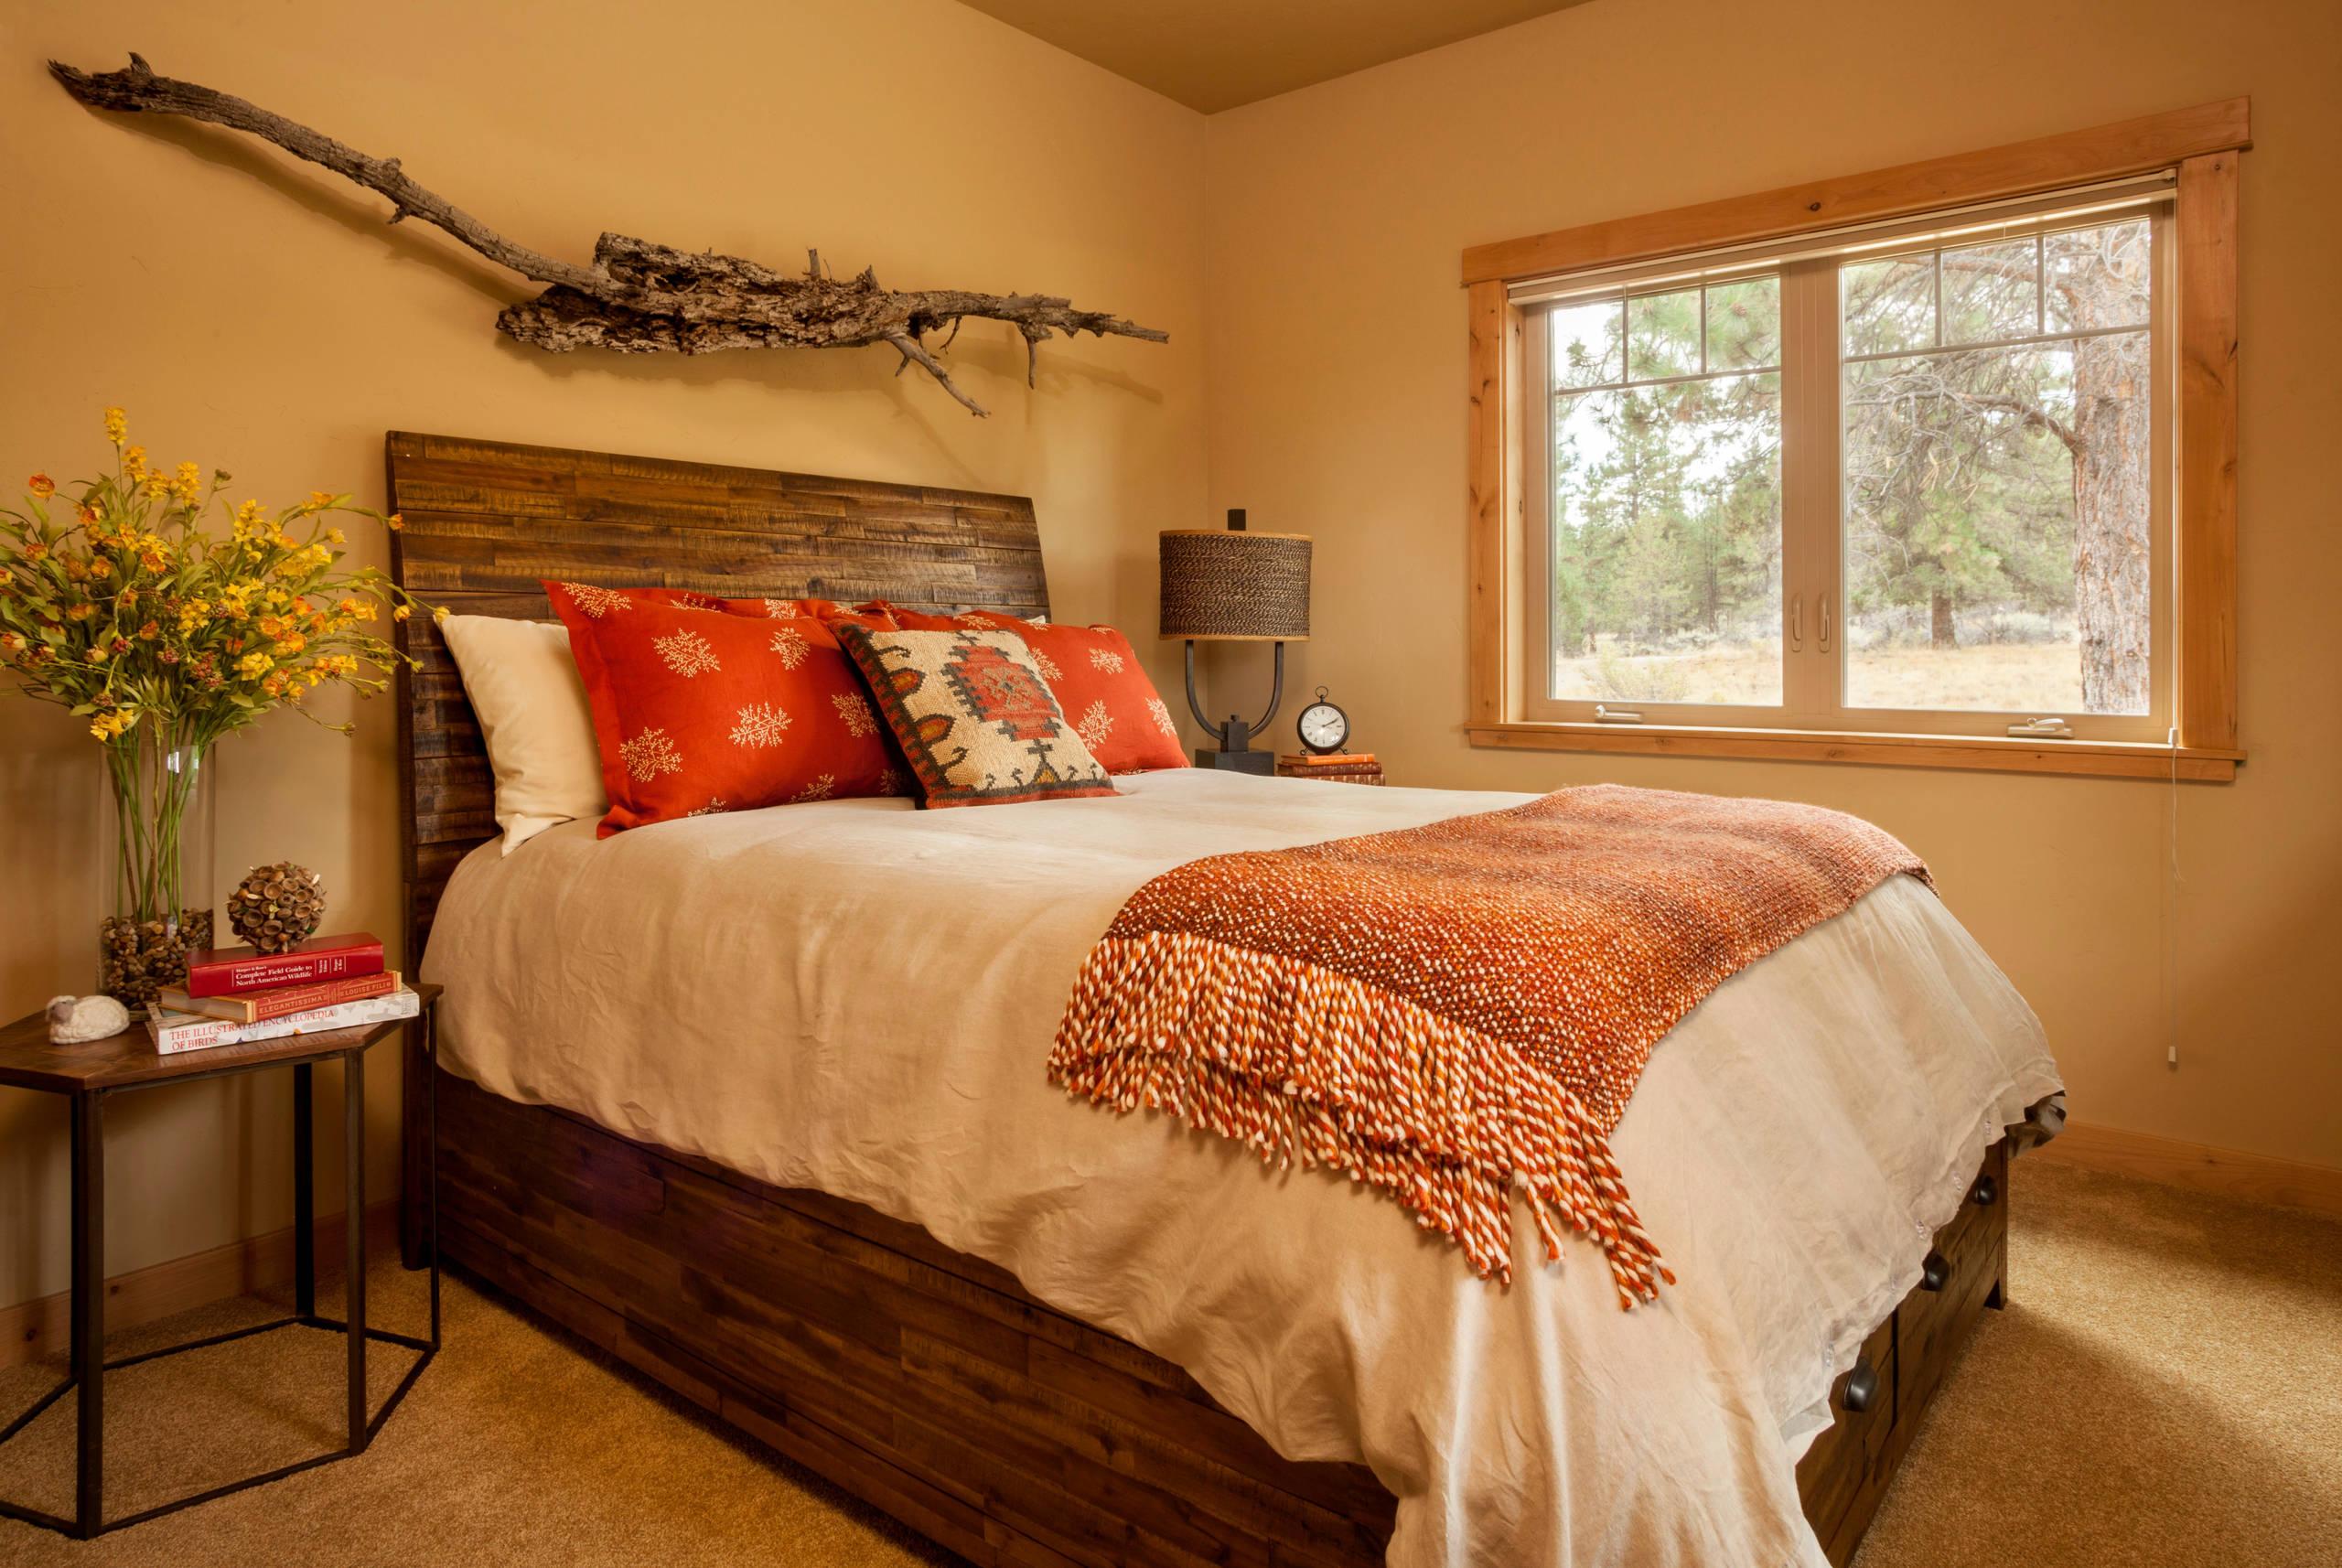 Rustic Interior Design by Lori Brock